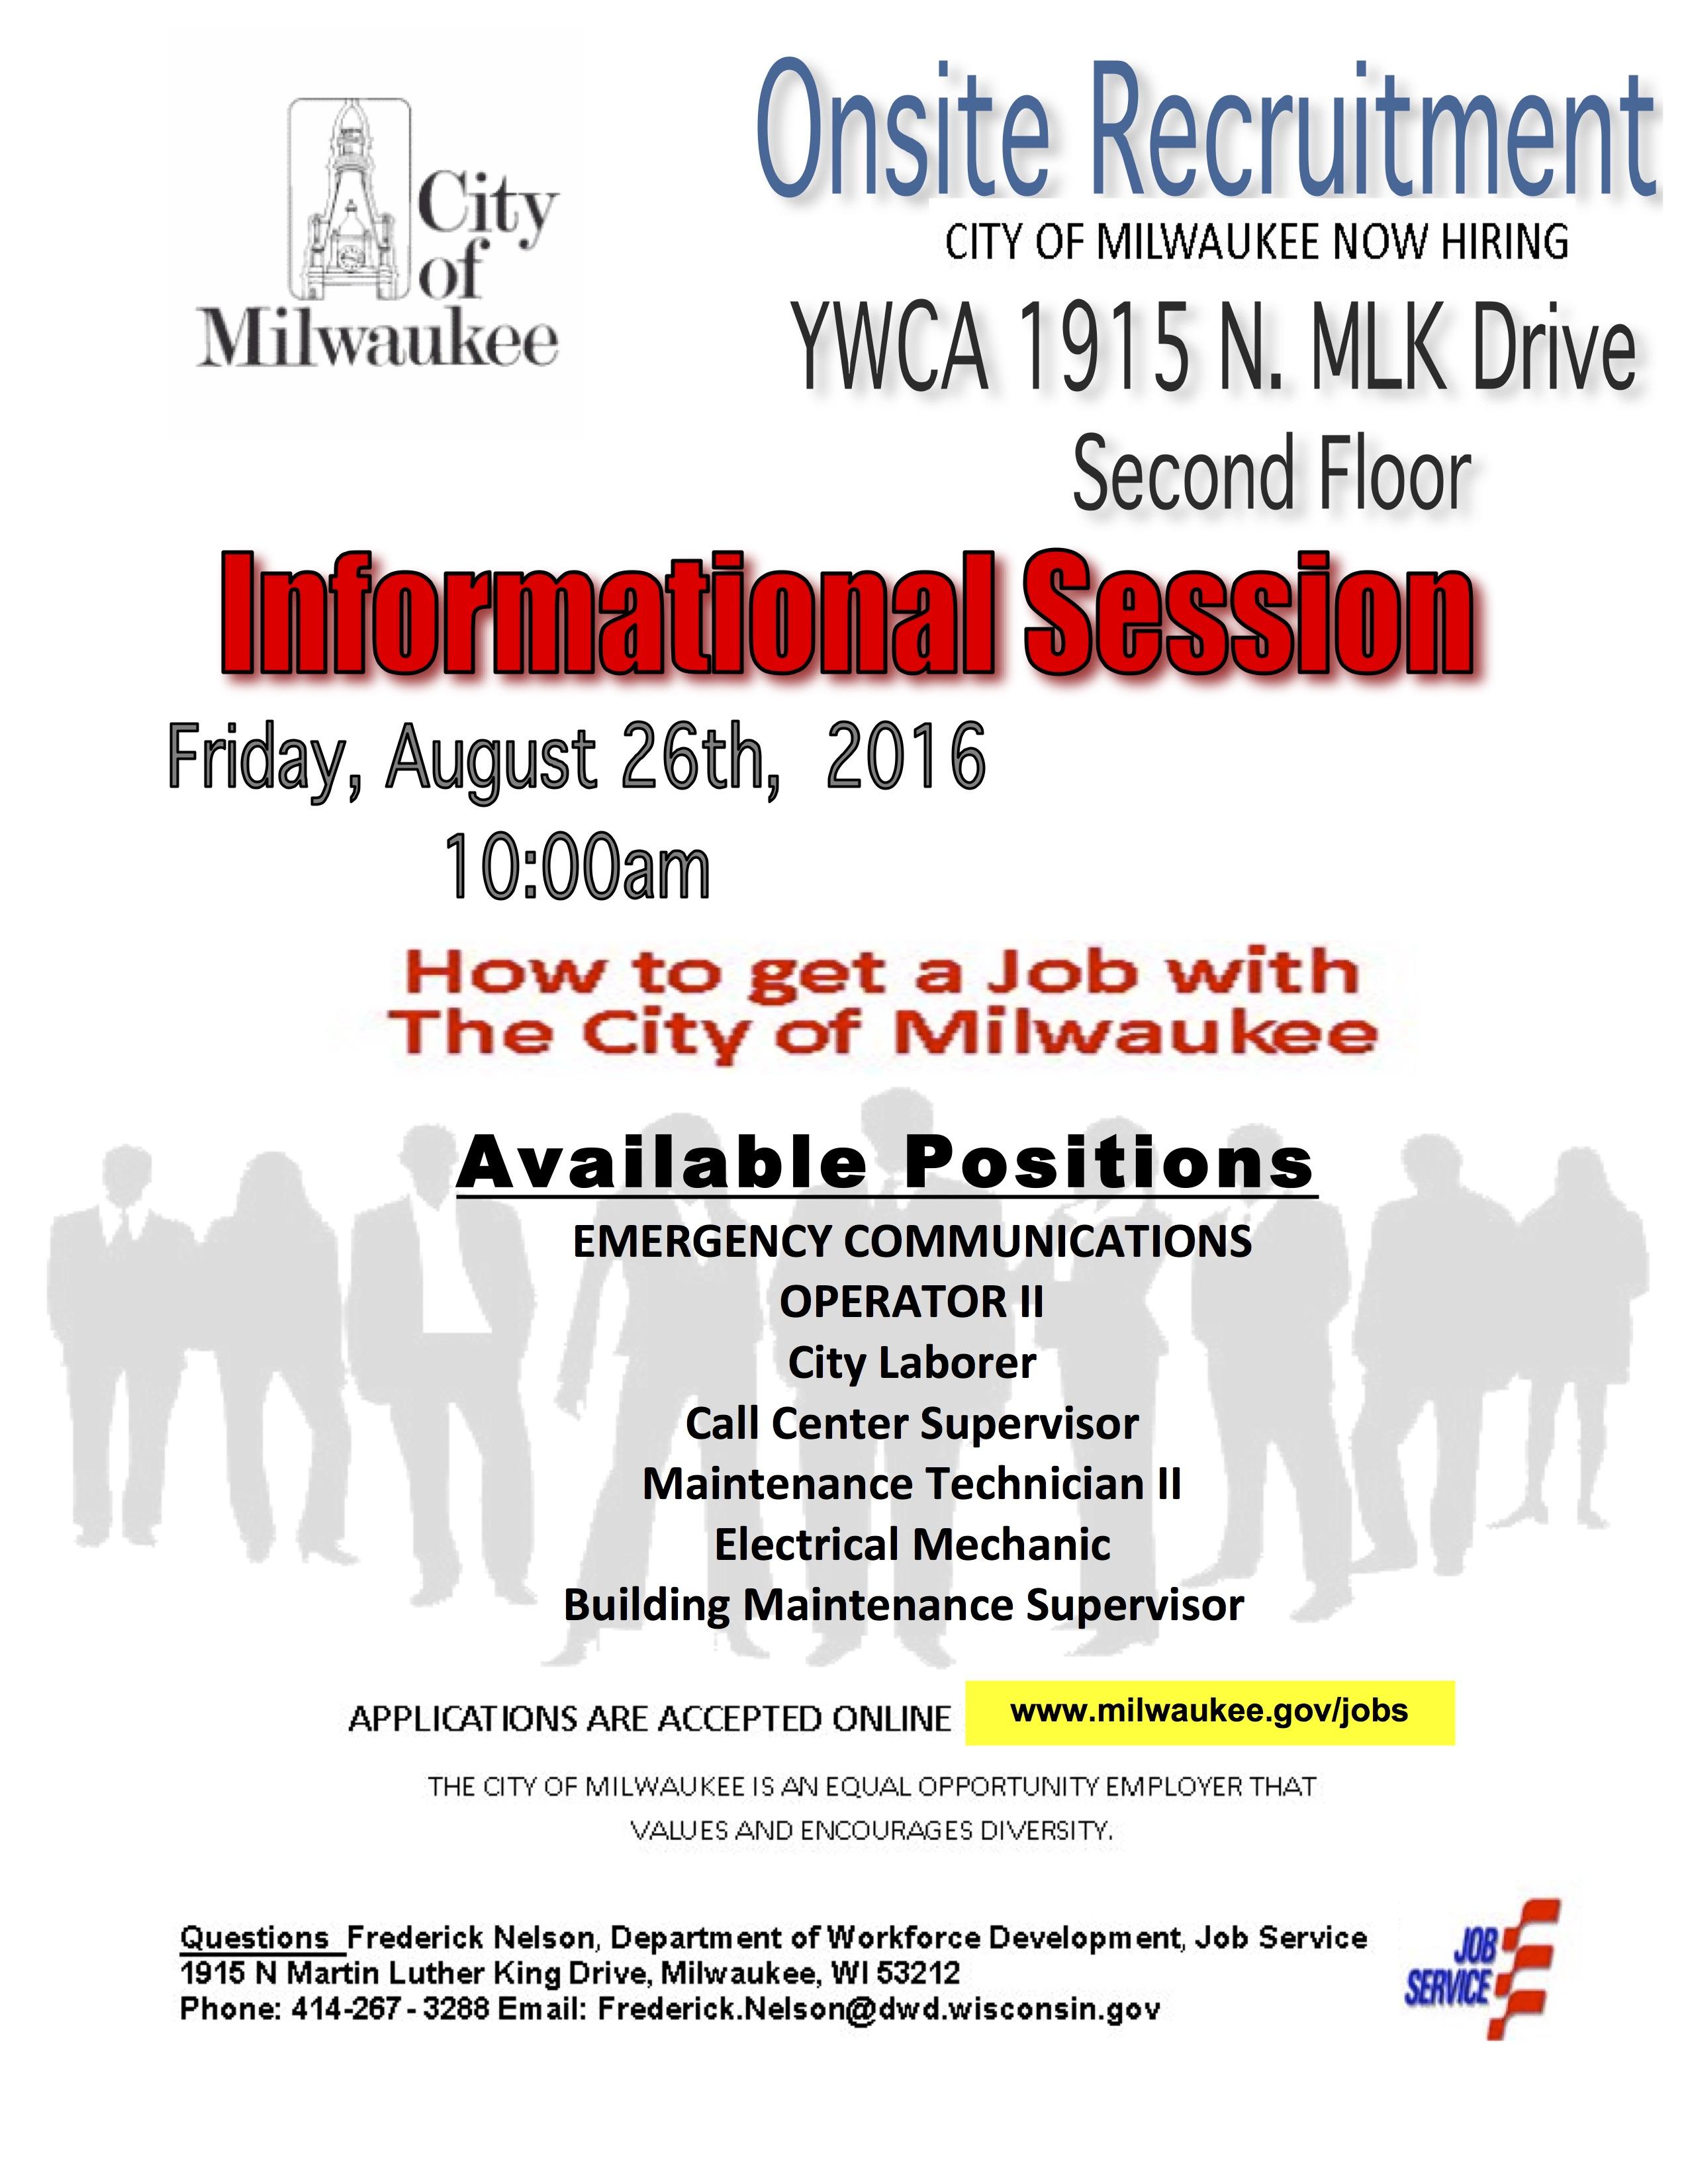 City of Milwaukee Jobs copy